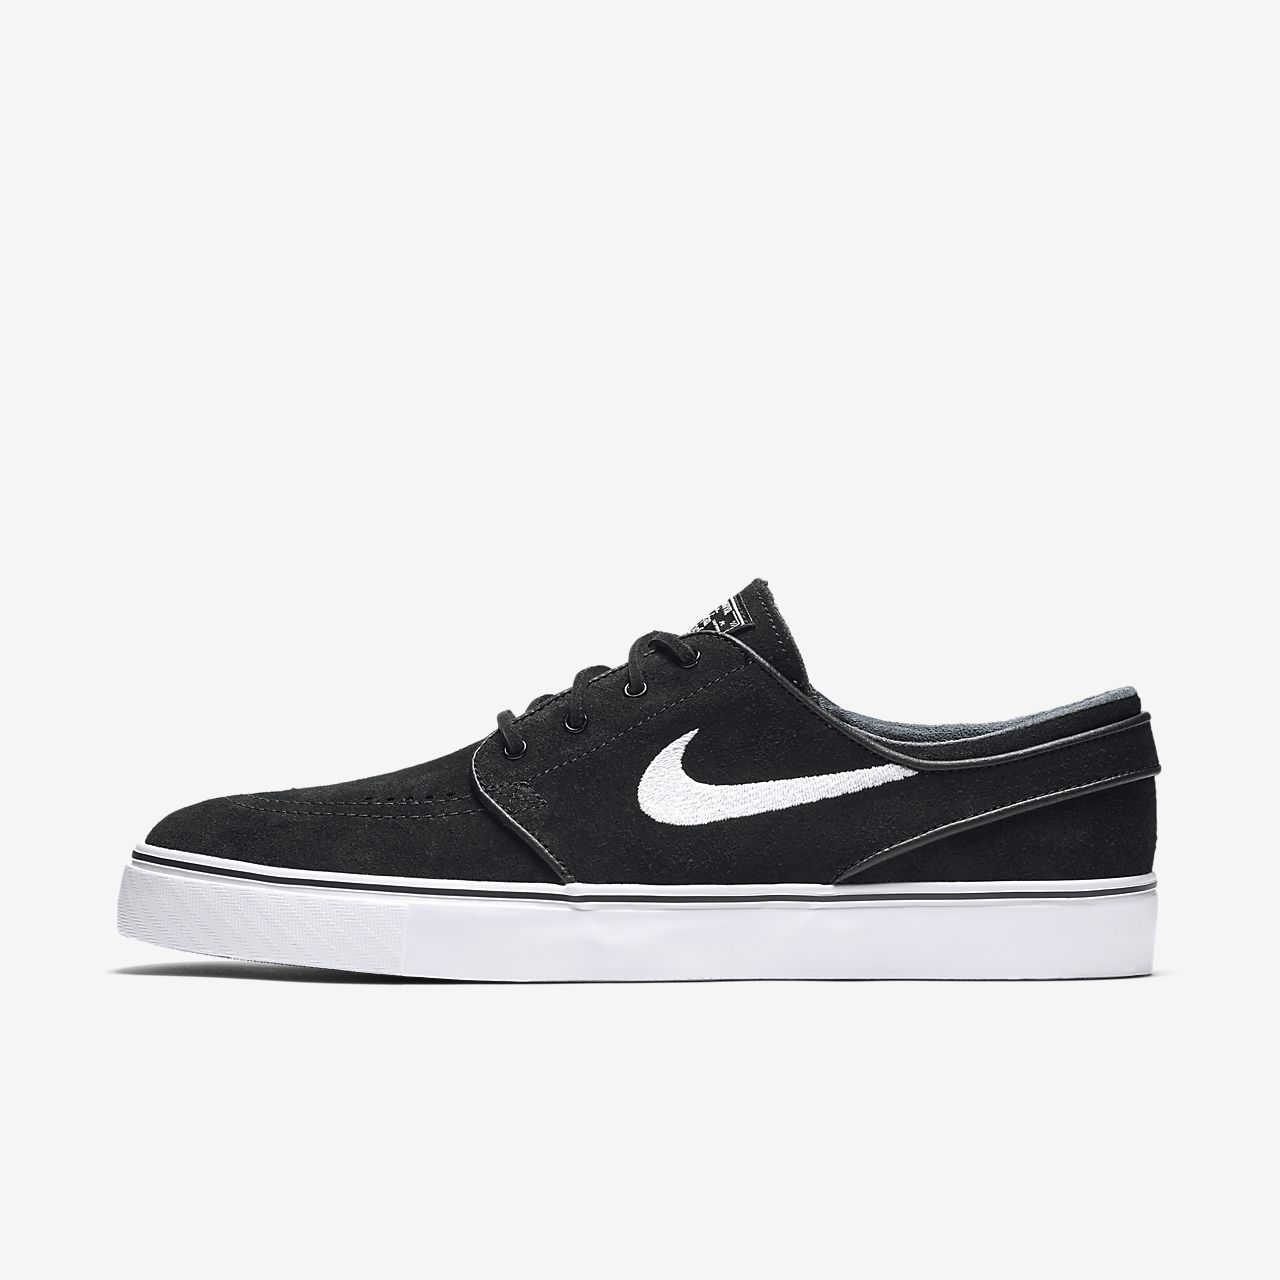 low priced a26ef e57b2 ... Scarpa da skate Nike SB Zoom Stefan Janoski OG - Uomo